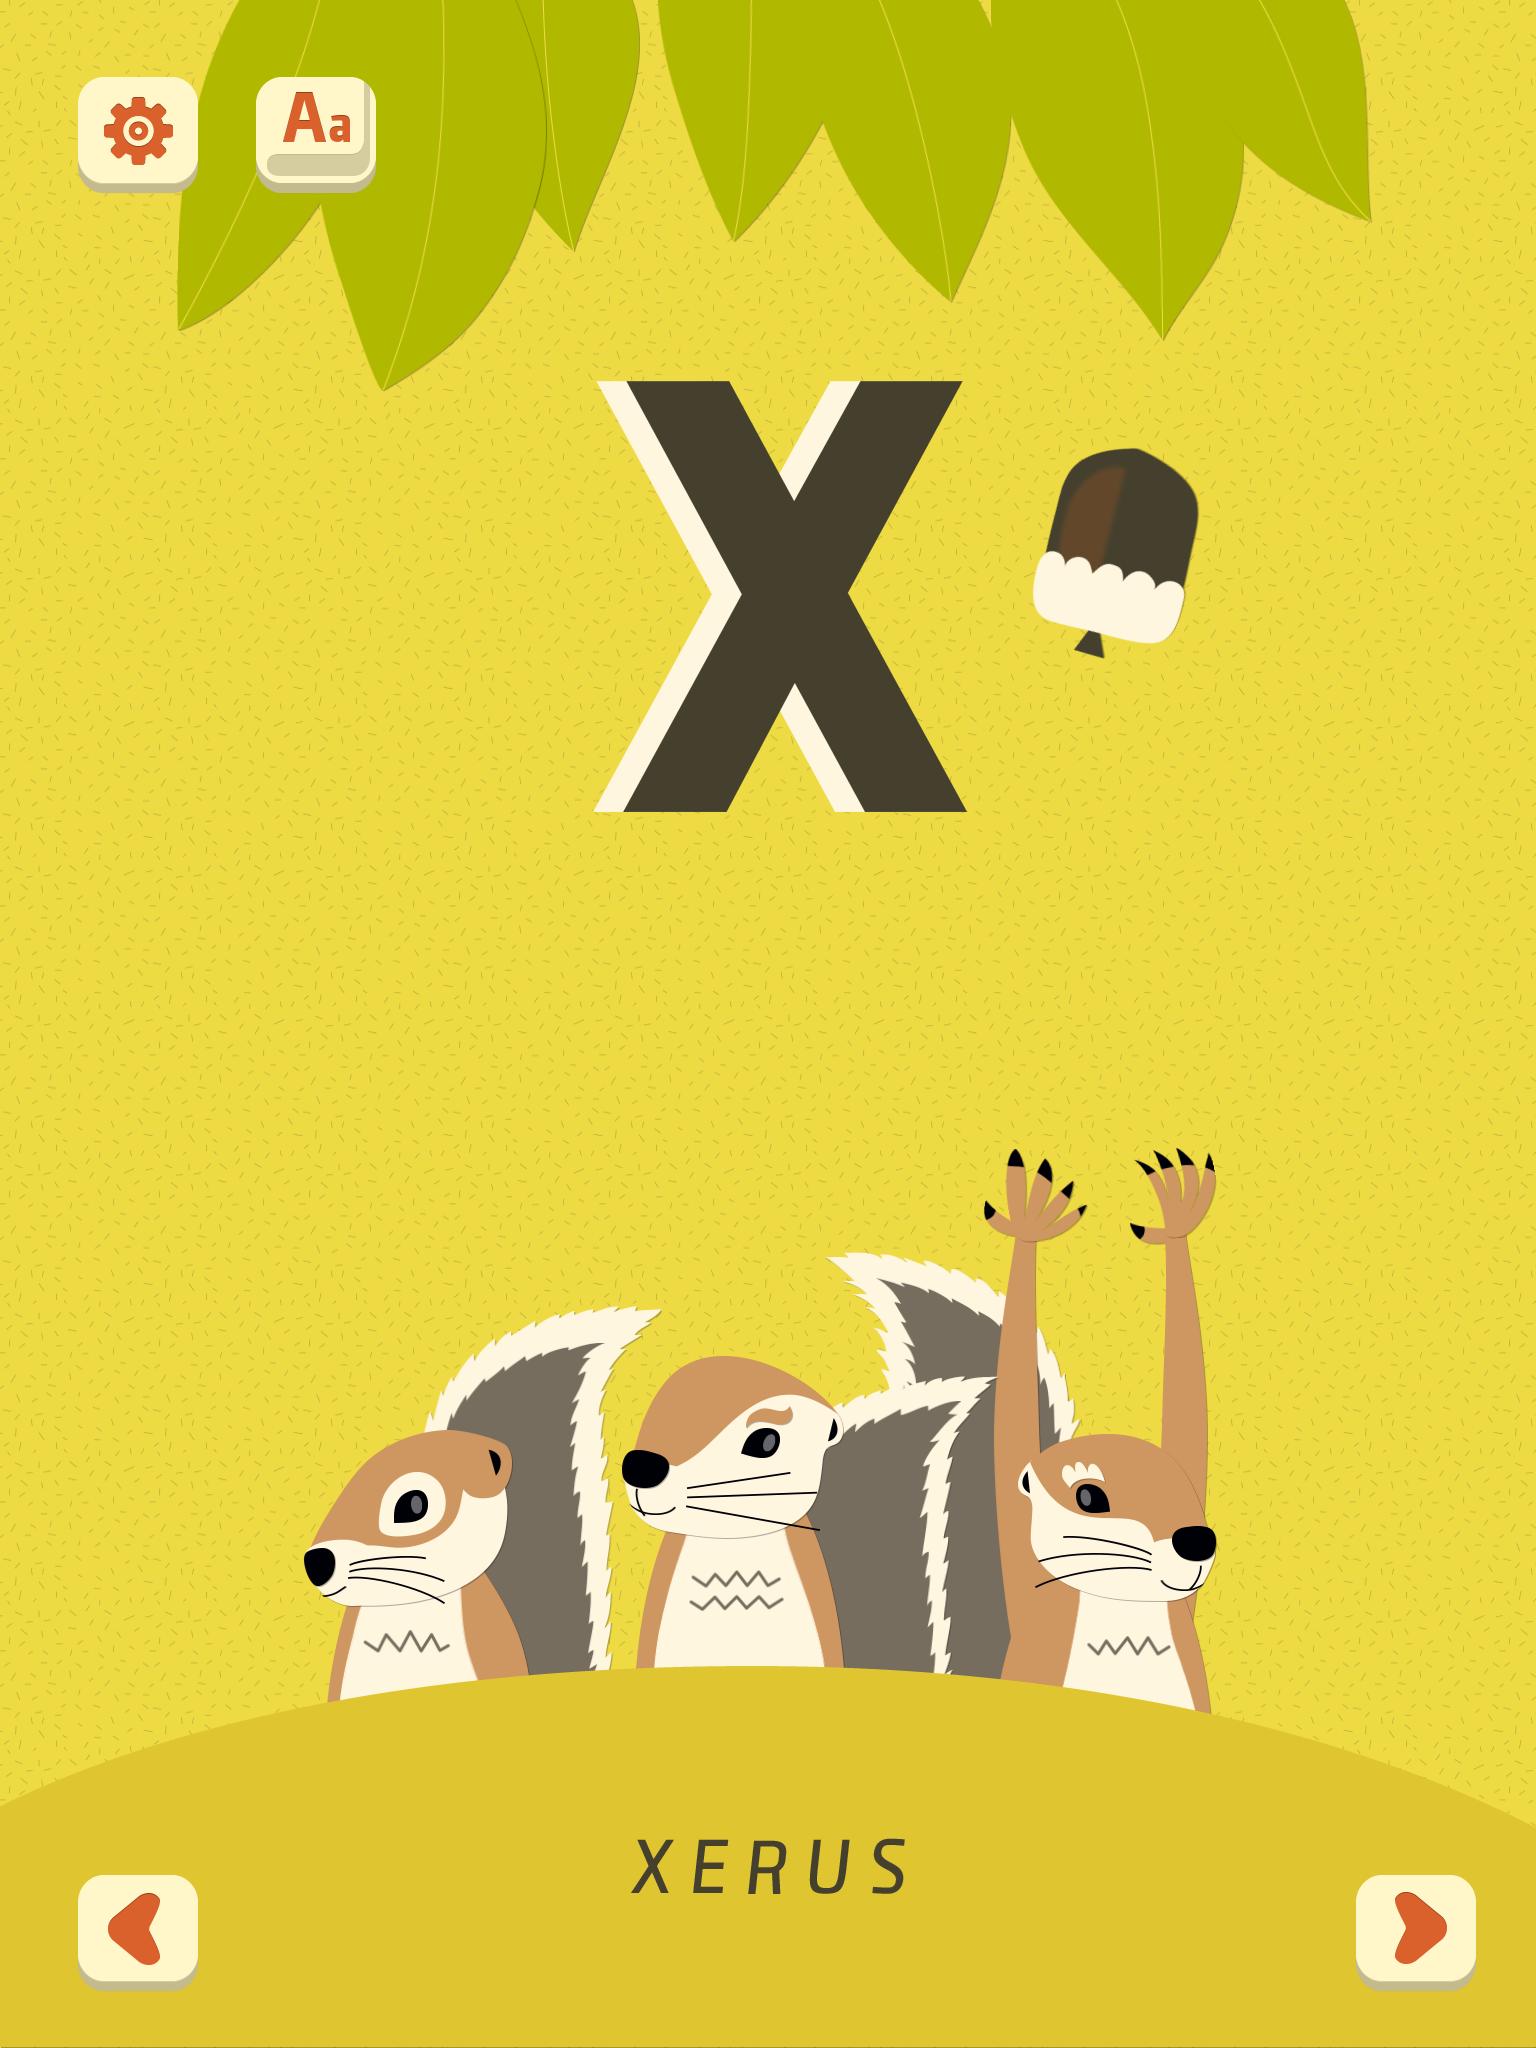 X Xerus. MiniU Zoo Alphabet, PopAppFactory, updated